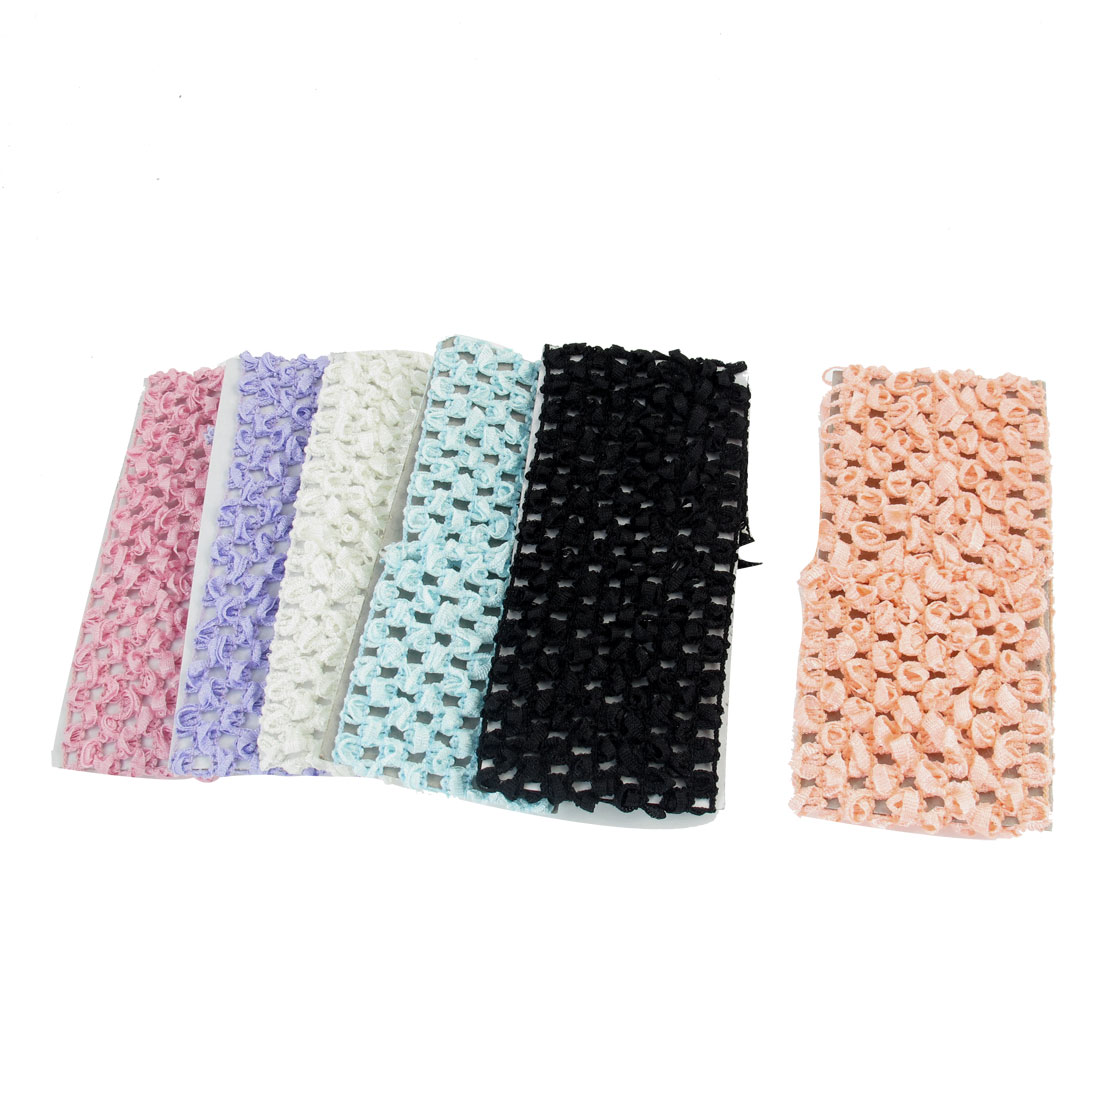 Nylon Choth Bathing Face Washing Elastic Scarf Hair Band Tie Multicolor 6 Pcs